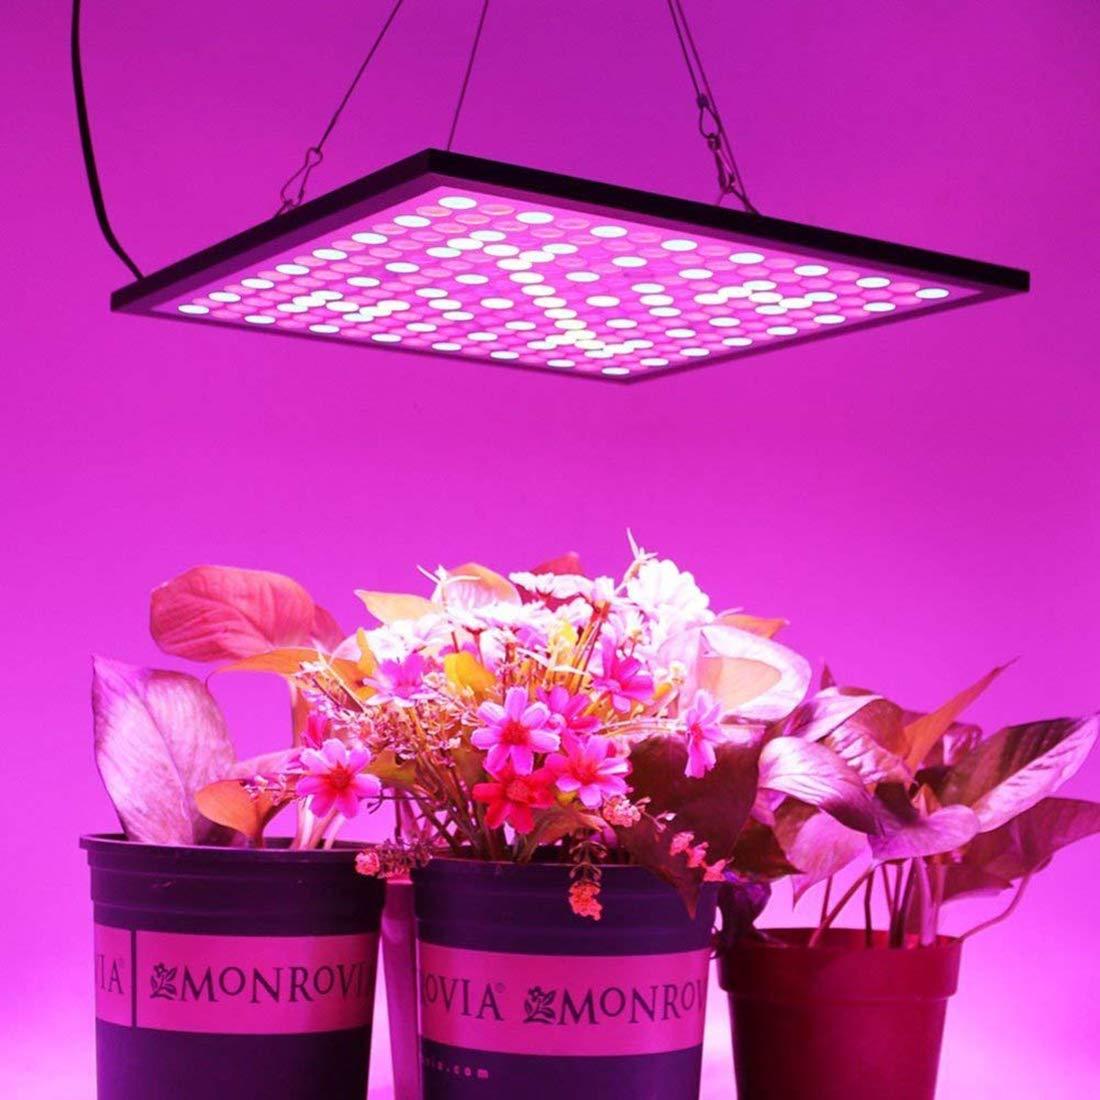 LED Plant Grow Light Panel,HNHC 45W Indoor Full Spectrum Hang Lamp w/Switch for Growing&Flowering by HNHC (Image #1)